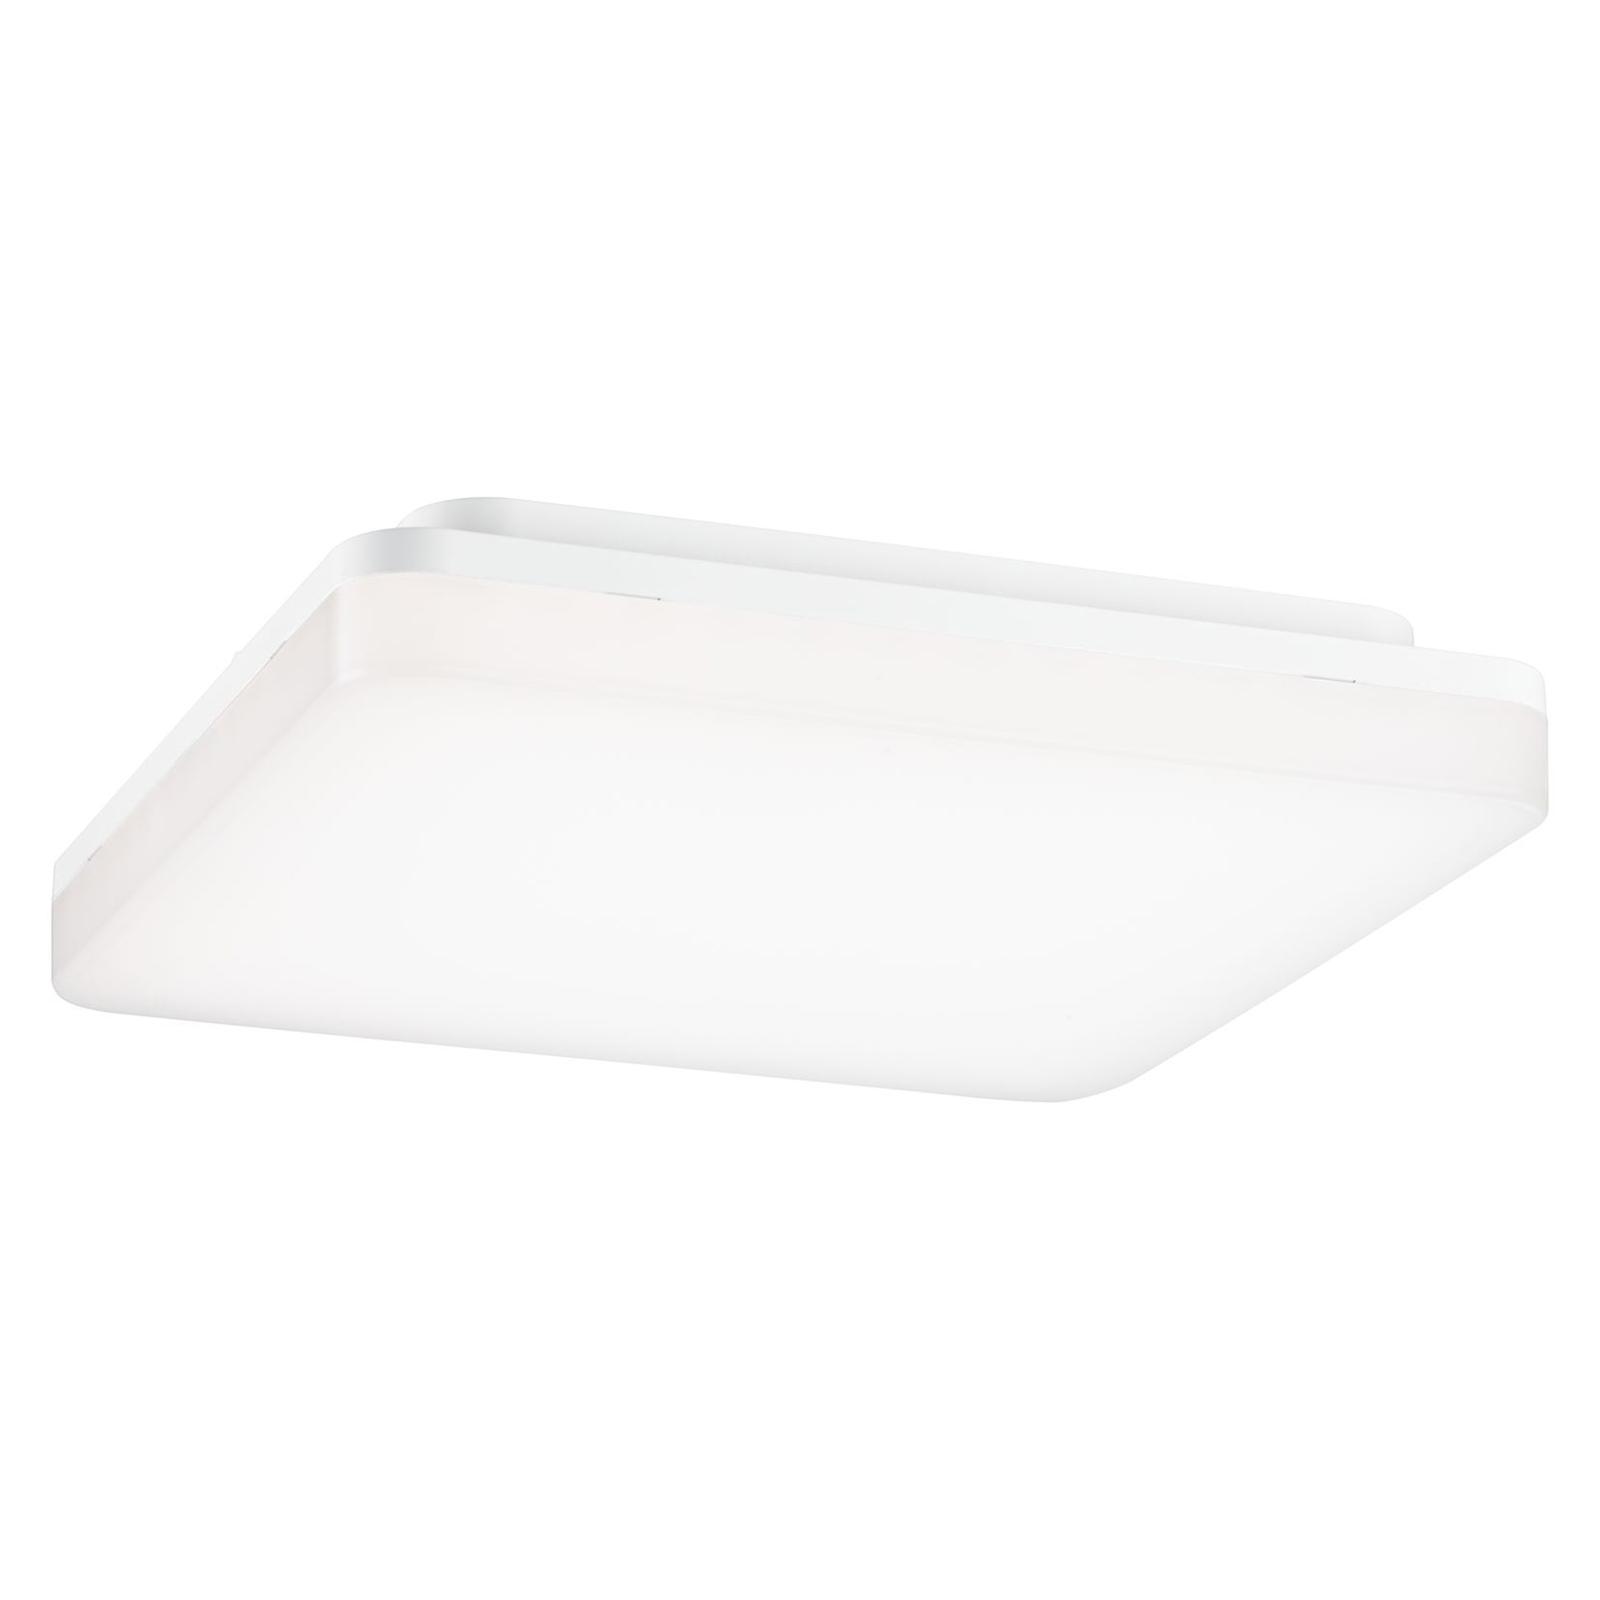 Paulmann Cela LED-Panel 28x28cm, White Switch